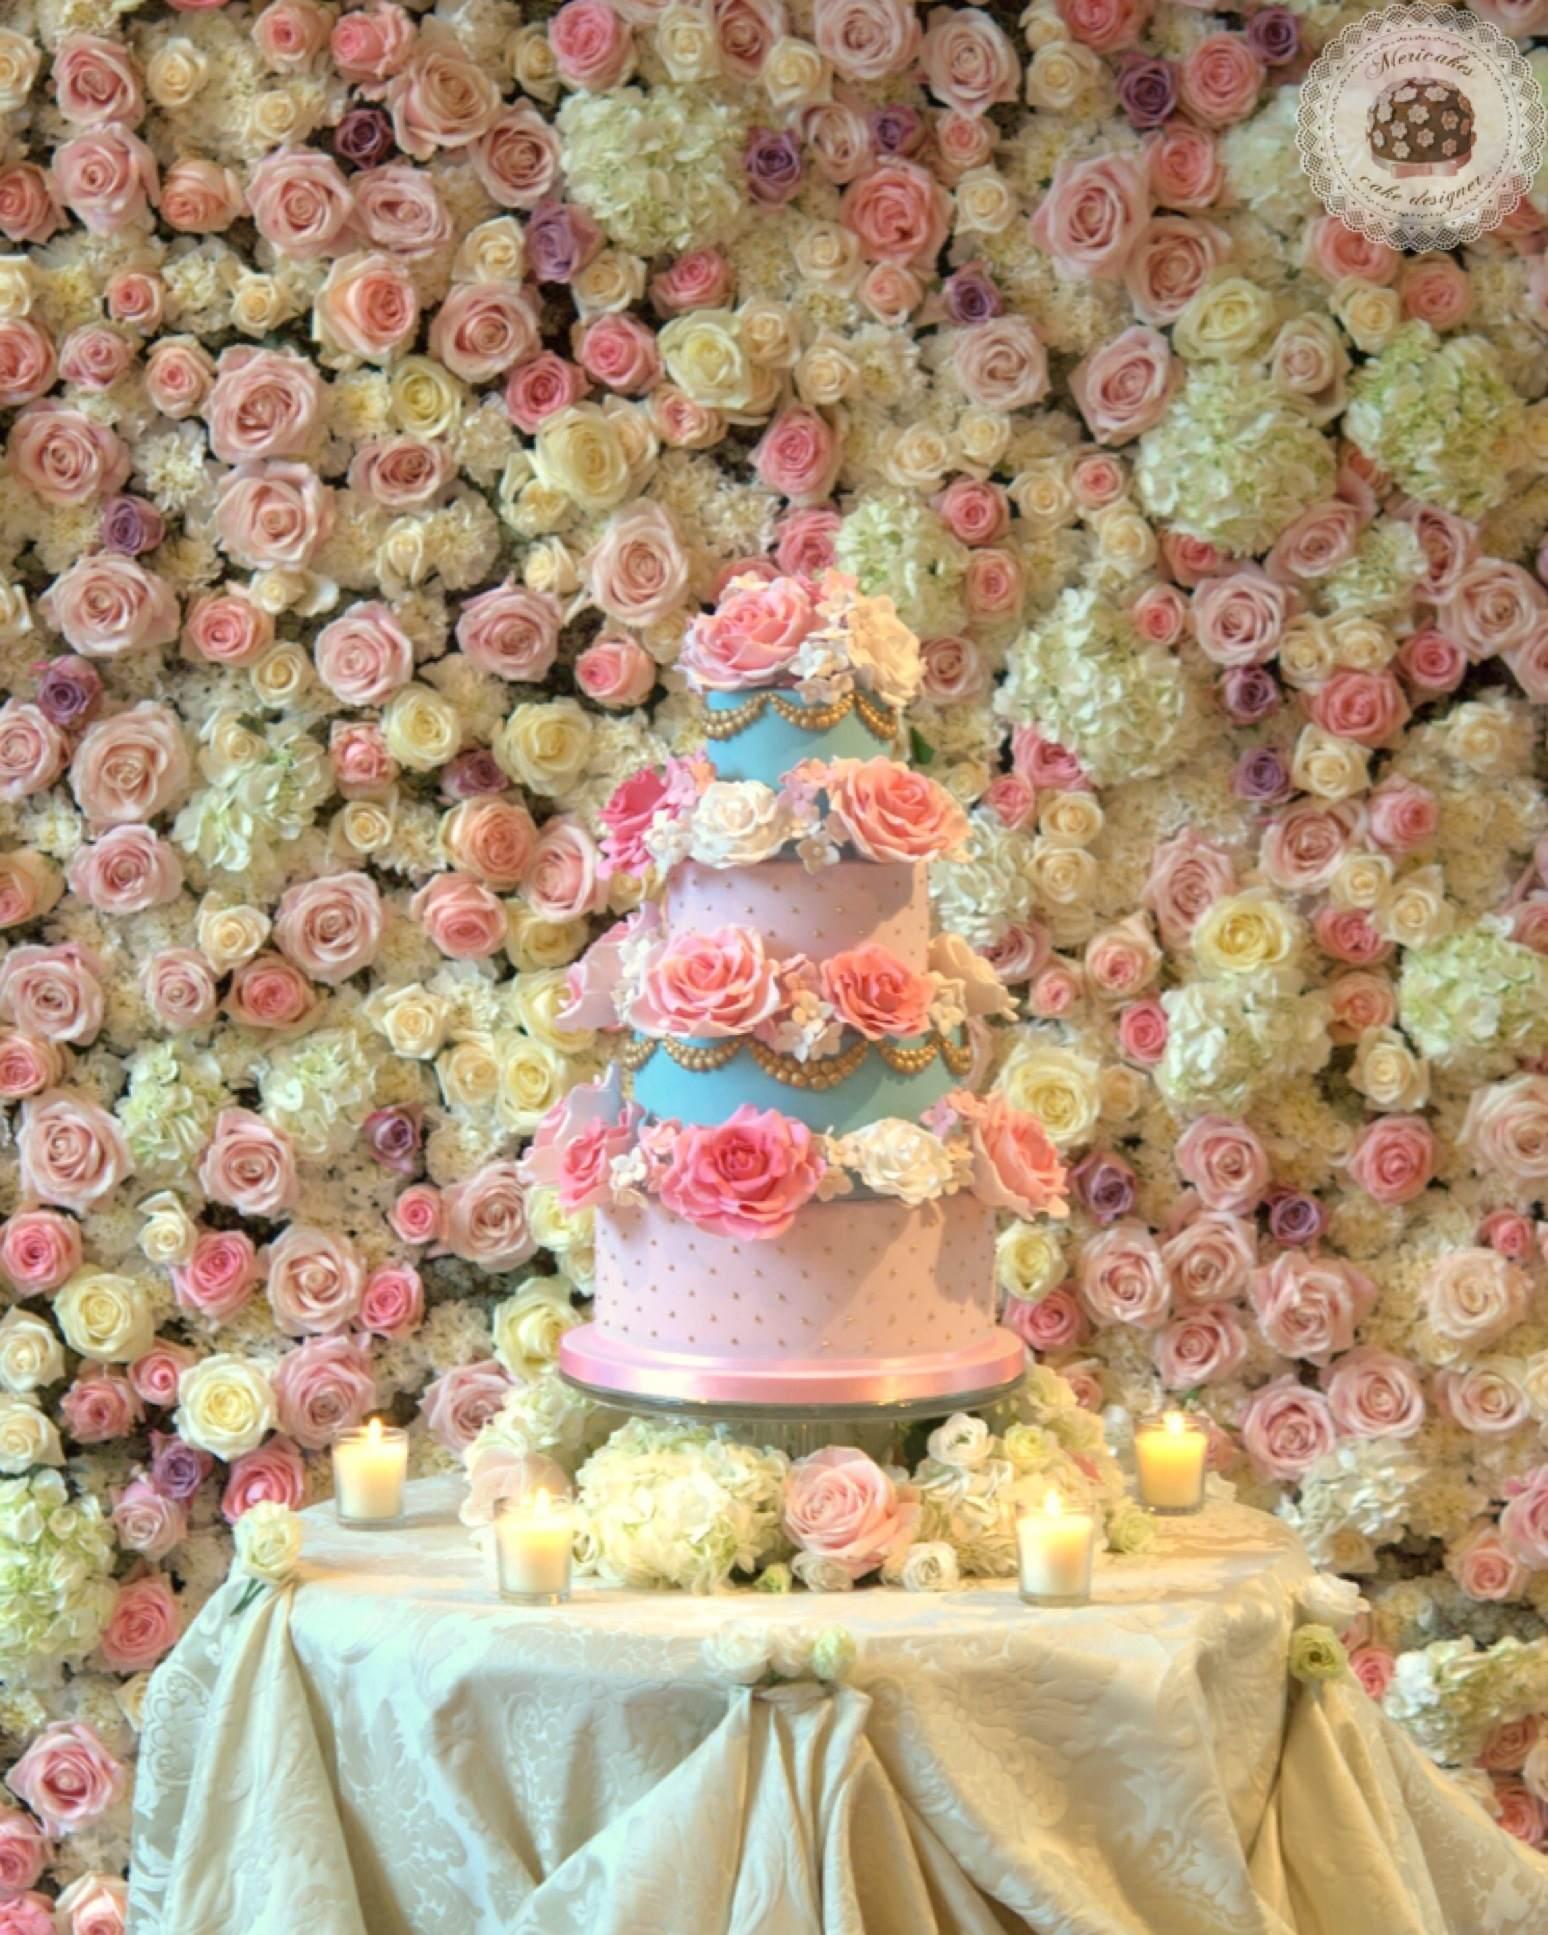 avalanche-roses-wedding-cake-tarta-de-boda-bodas-barcelona-mericakes-fondant-barcelona-wedding-bridal-rosas-19